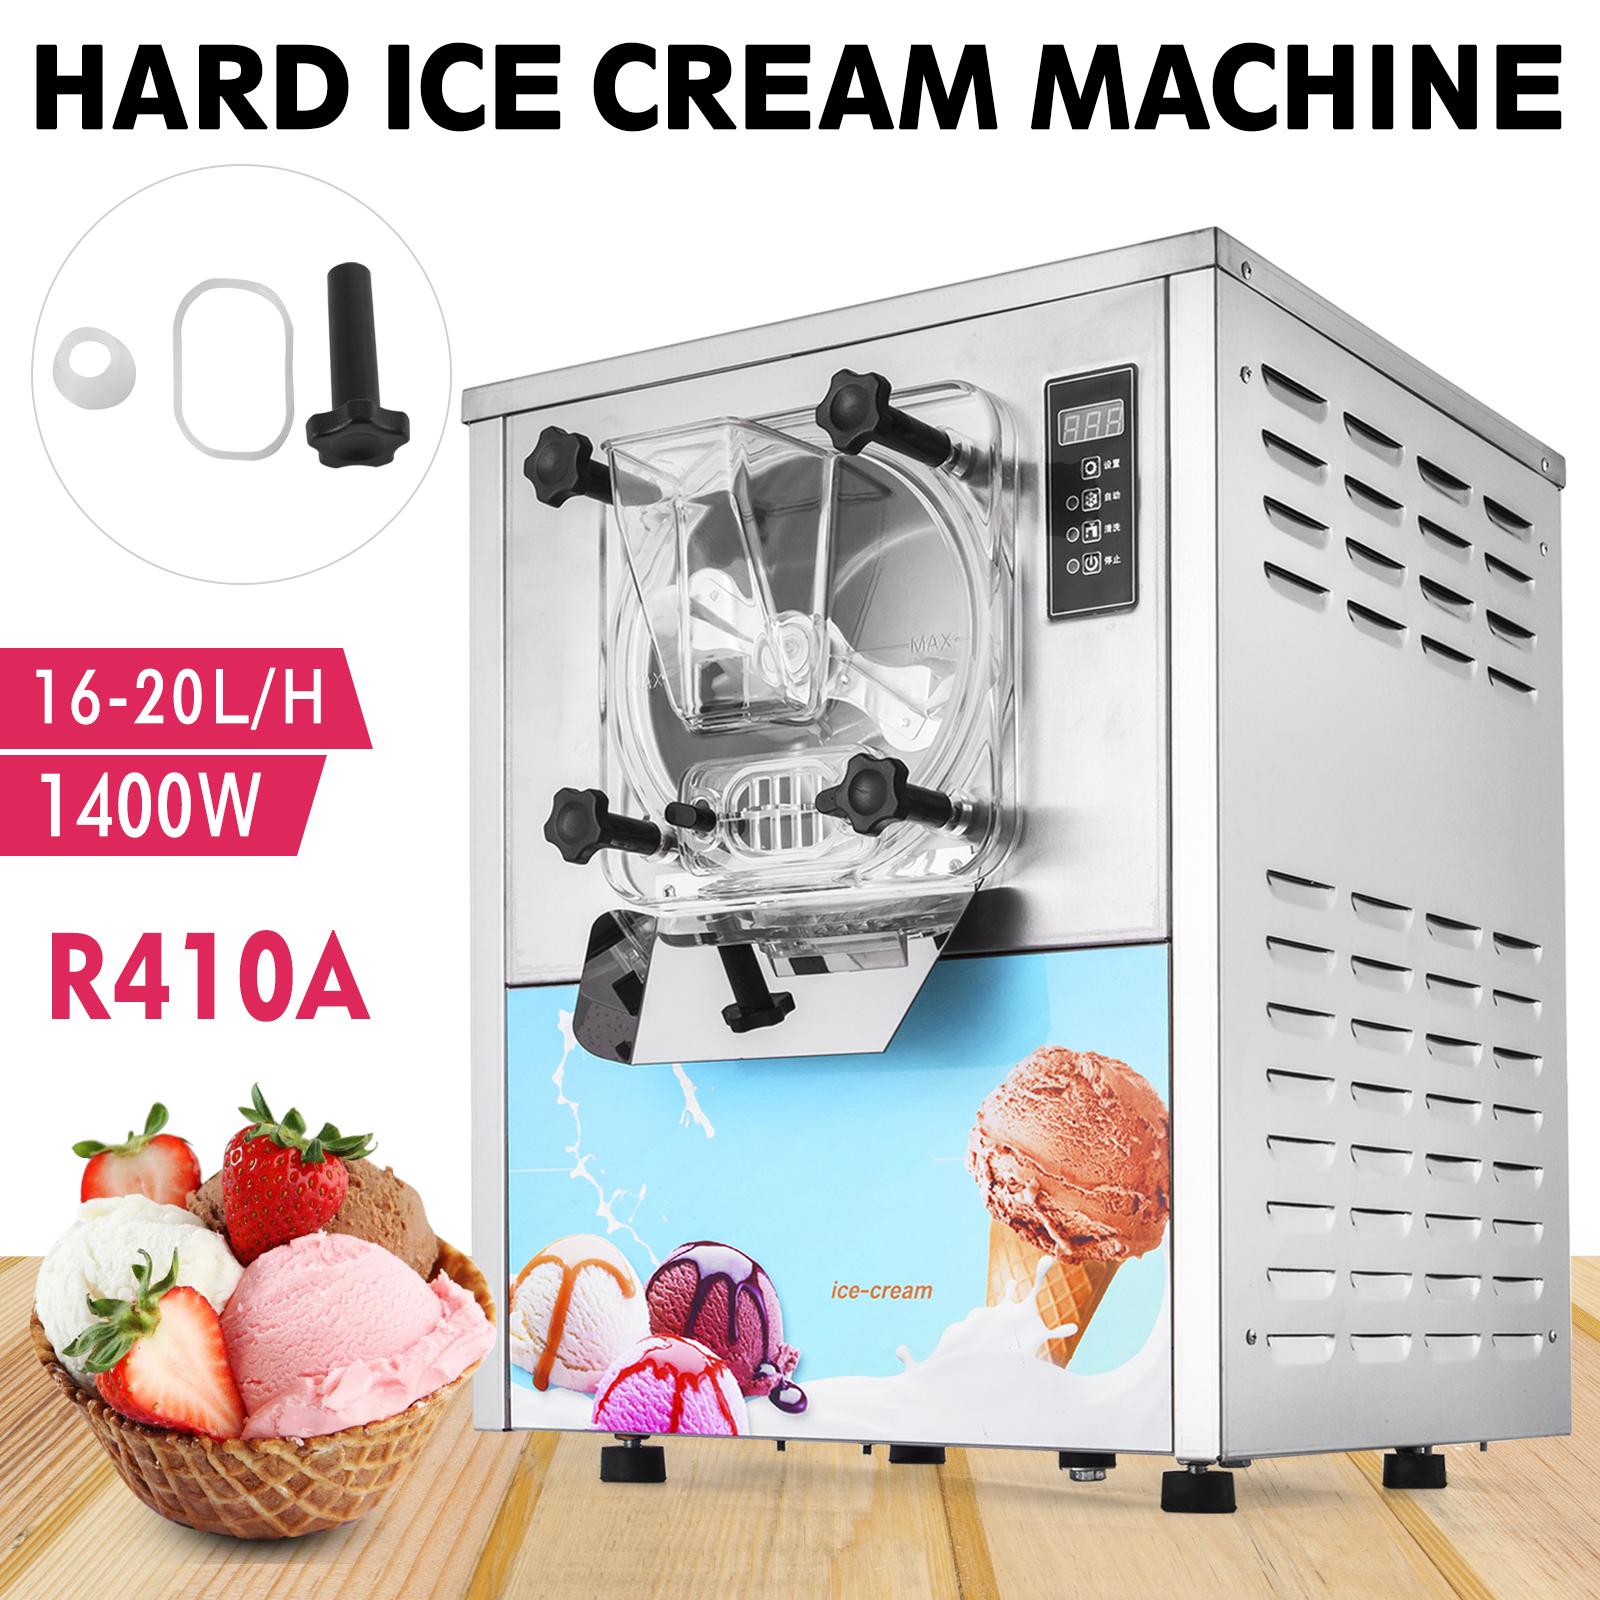 YKF-116 Commercial Ice Cream Sorbet Making Batch Freezer Gelato Machine Hard Ice Cream Machine